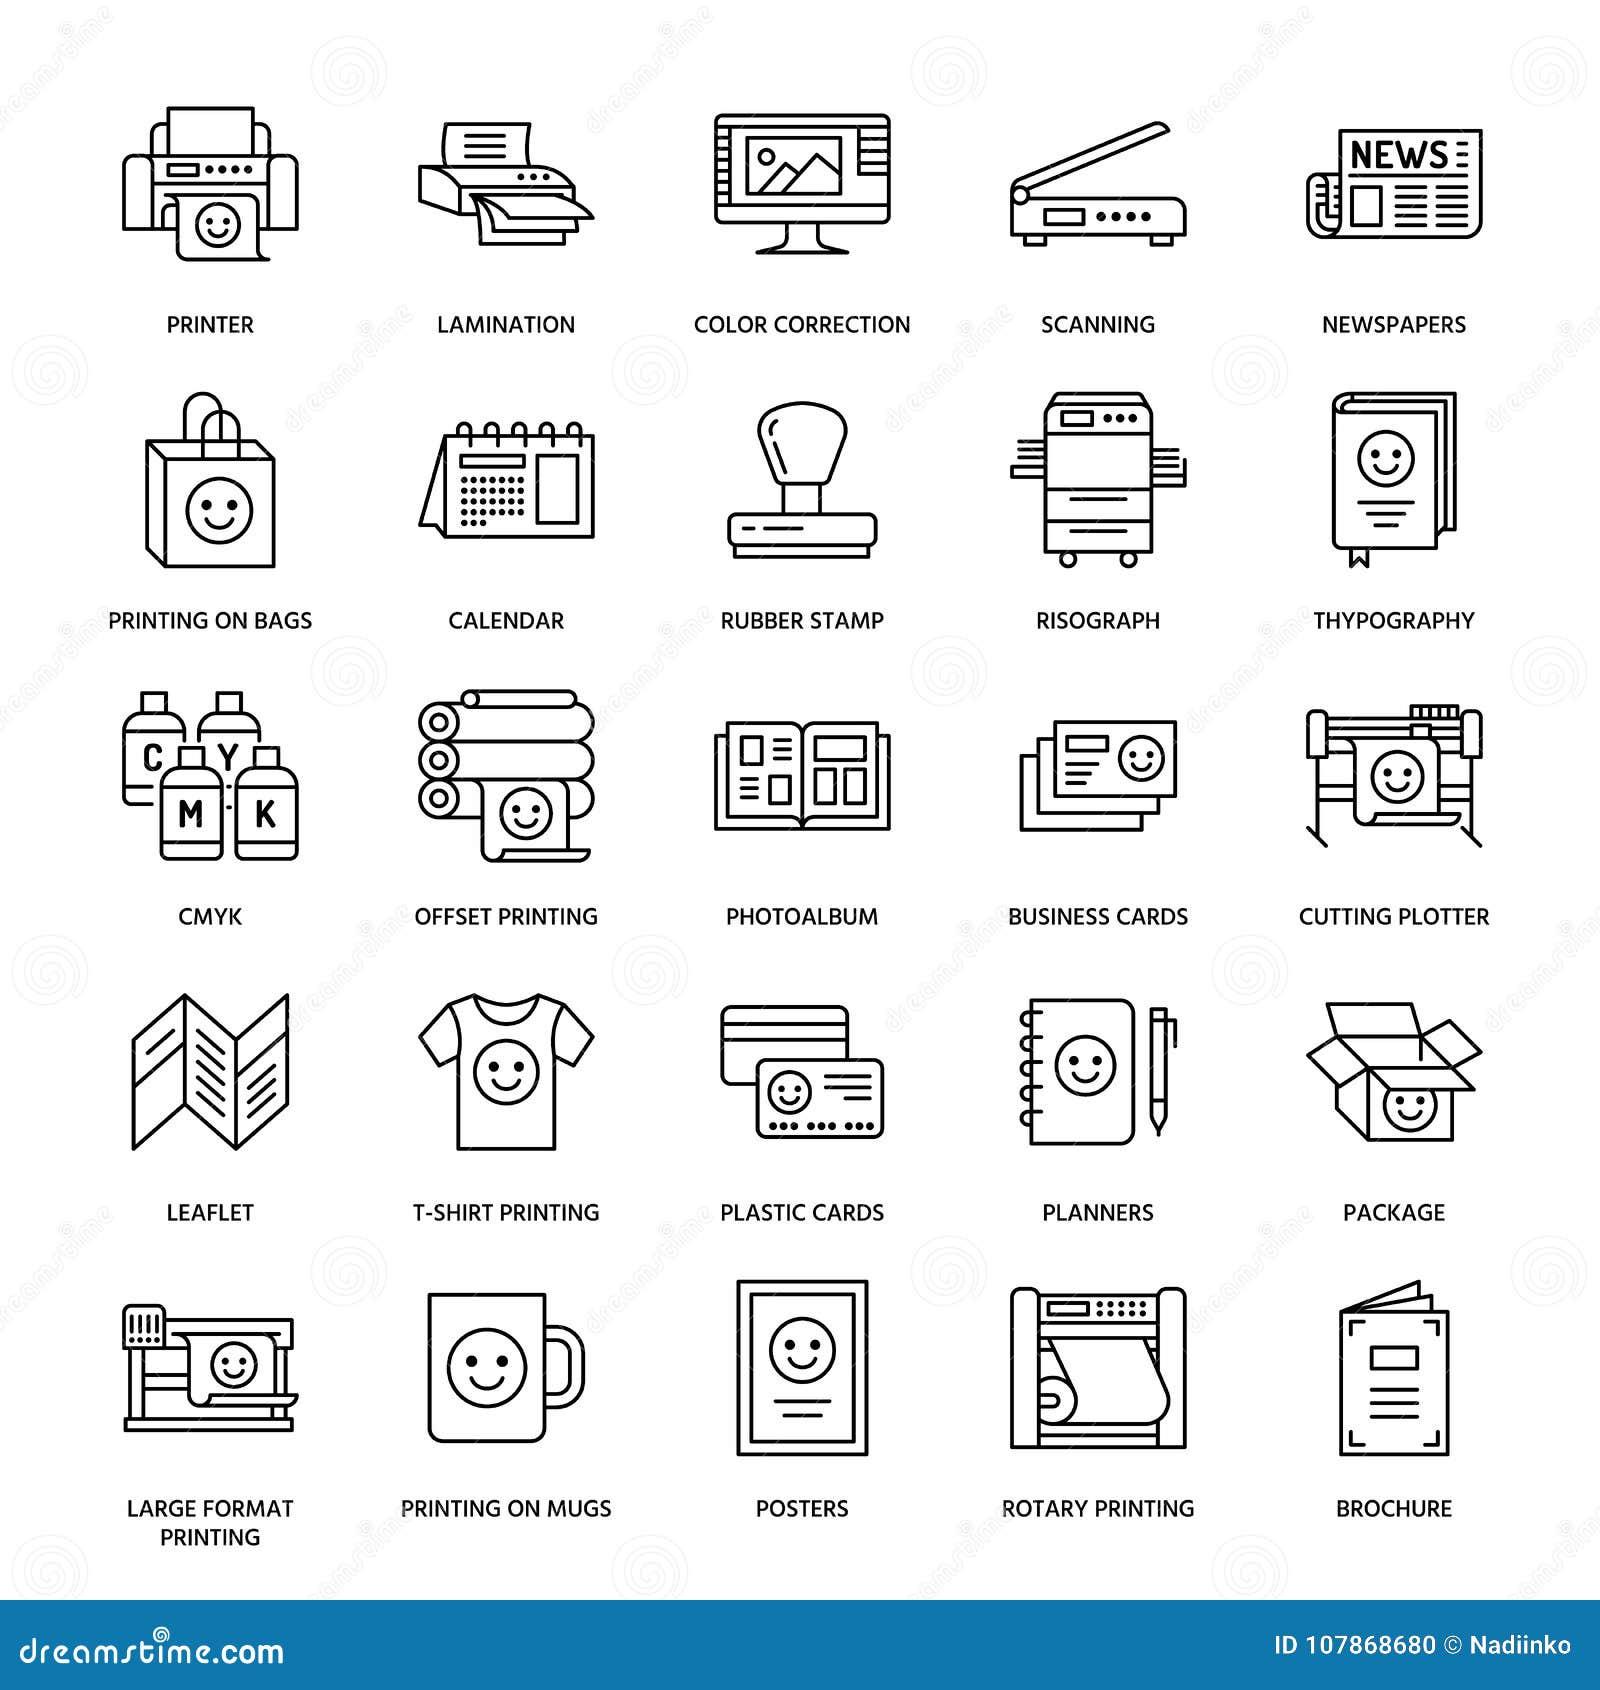 Printing house flat line icons. Print shop equipment - printer, scanner, offset machine, plotter, brochure, rubber stamp